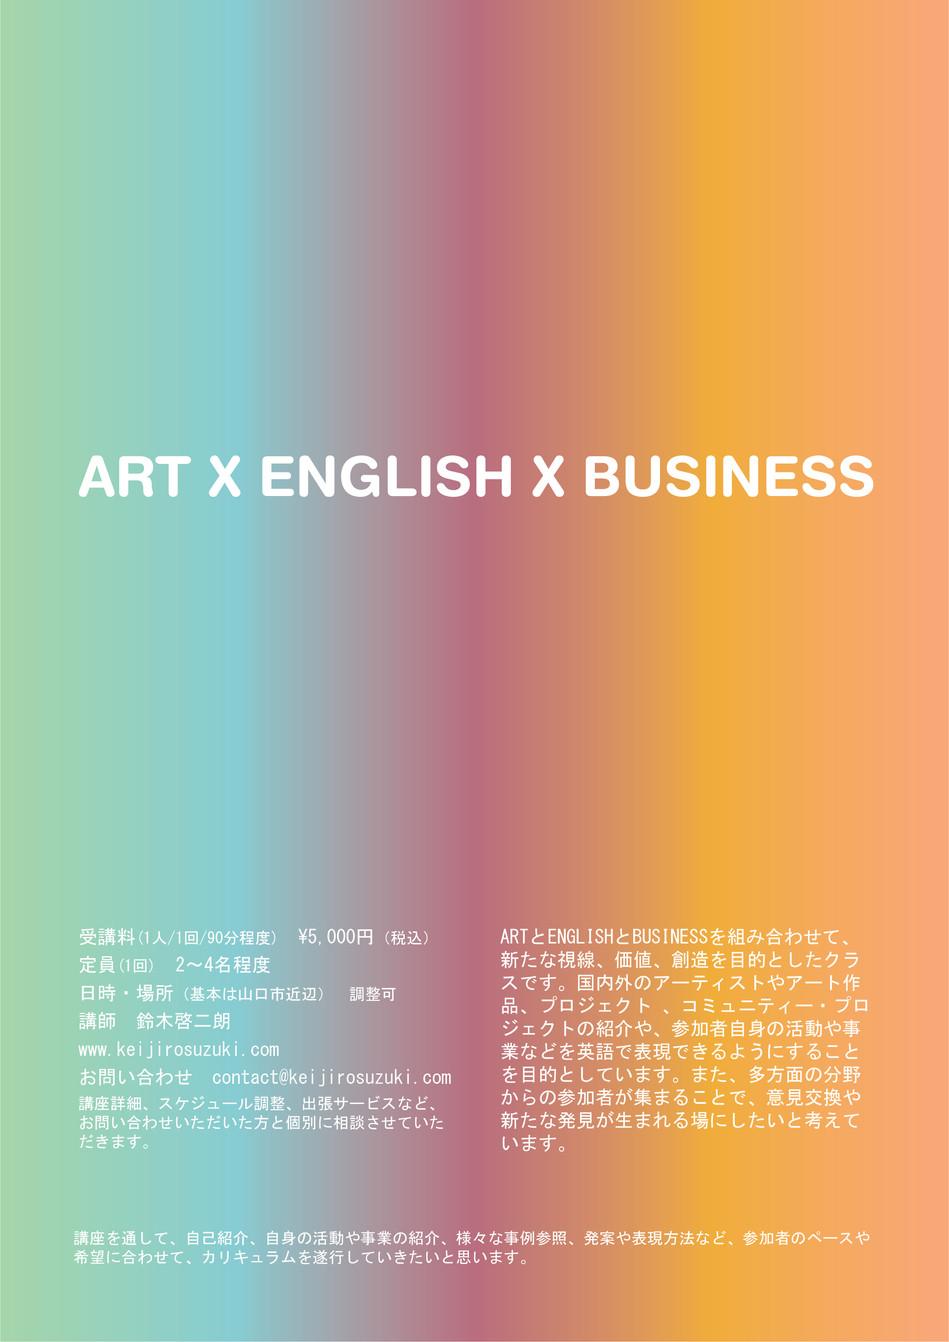 ARTxENGLISHxBUSINESS-01.jpg